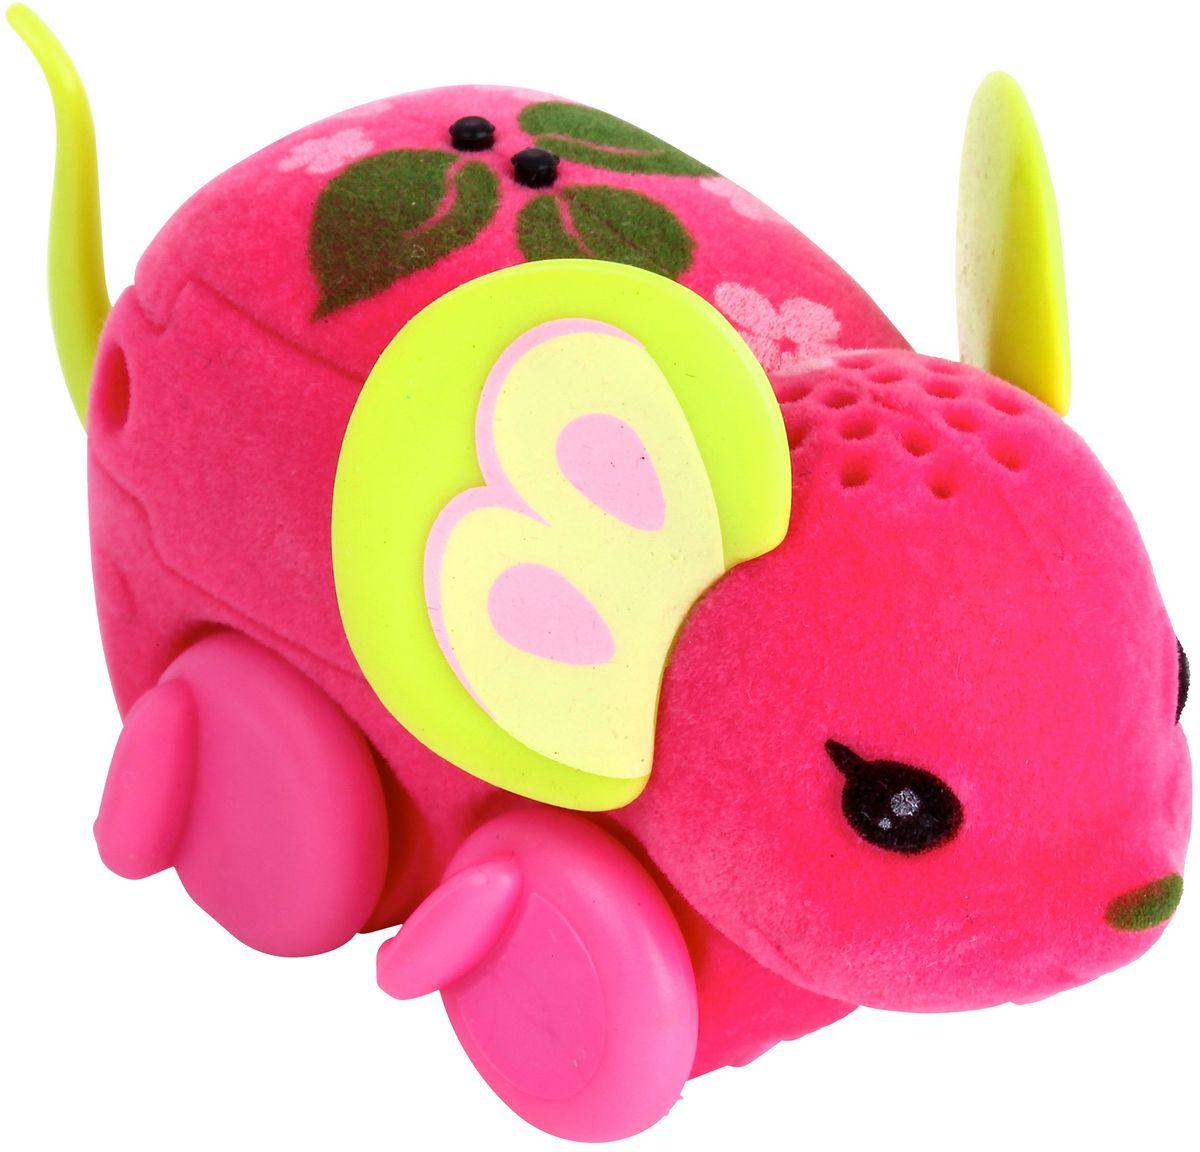 Moose Интерактивная игрушка Мышка Apple Boppin - Интерактивные игрушки